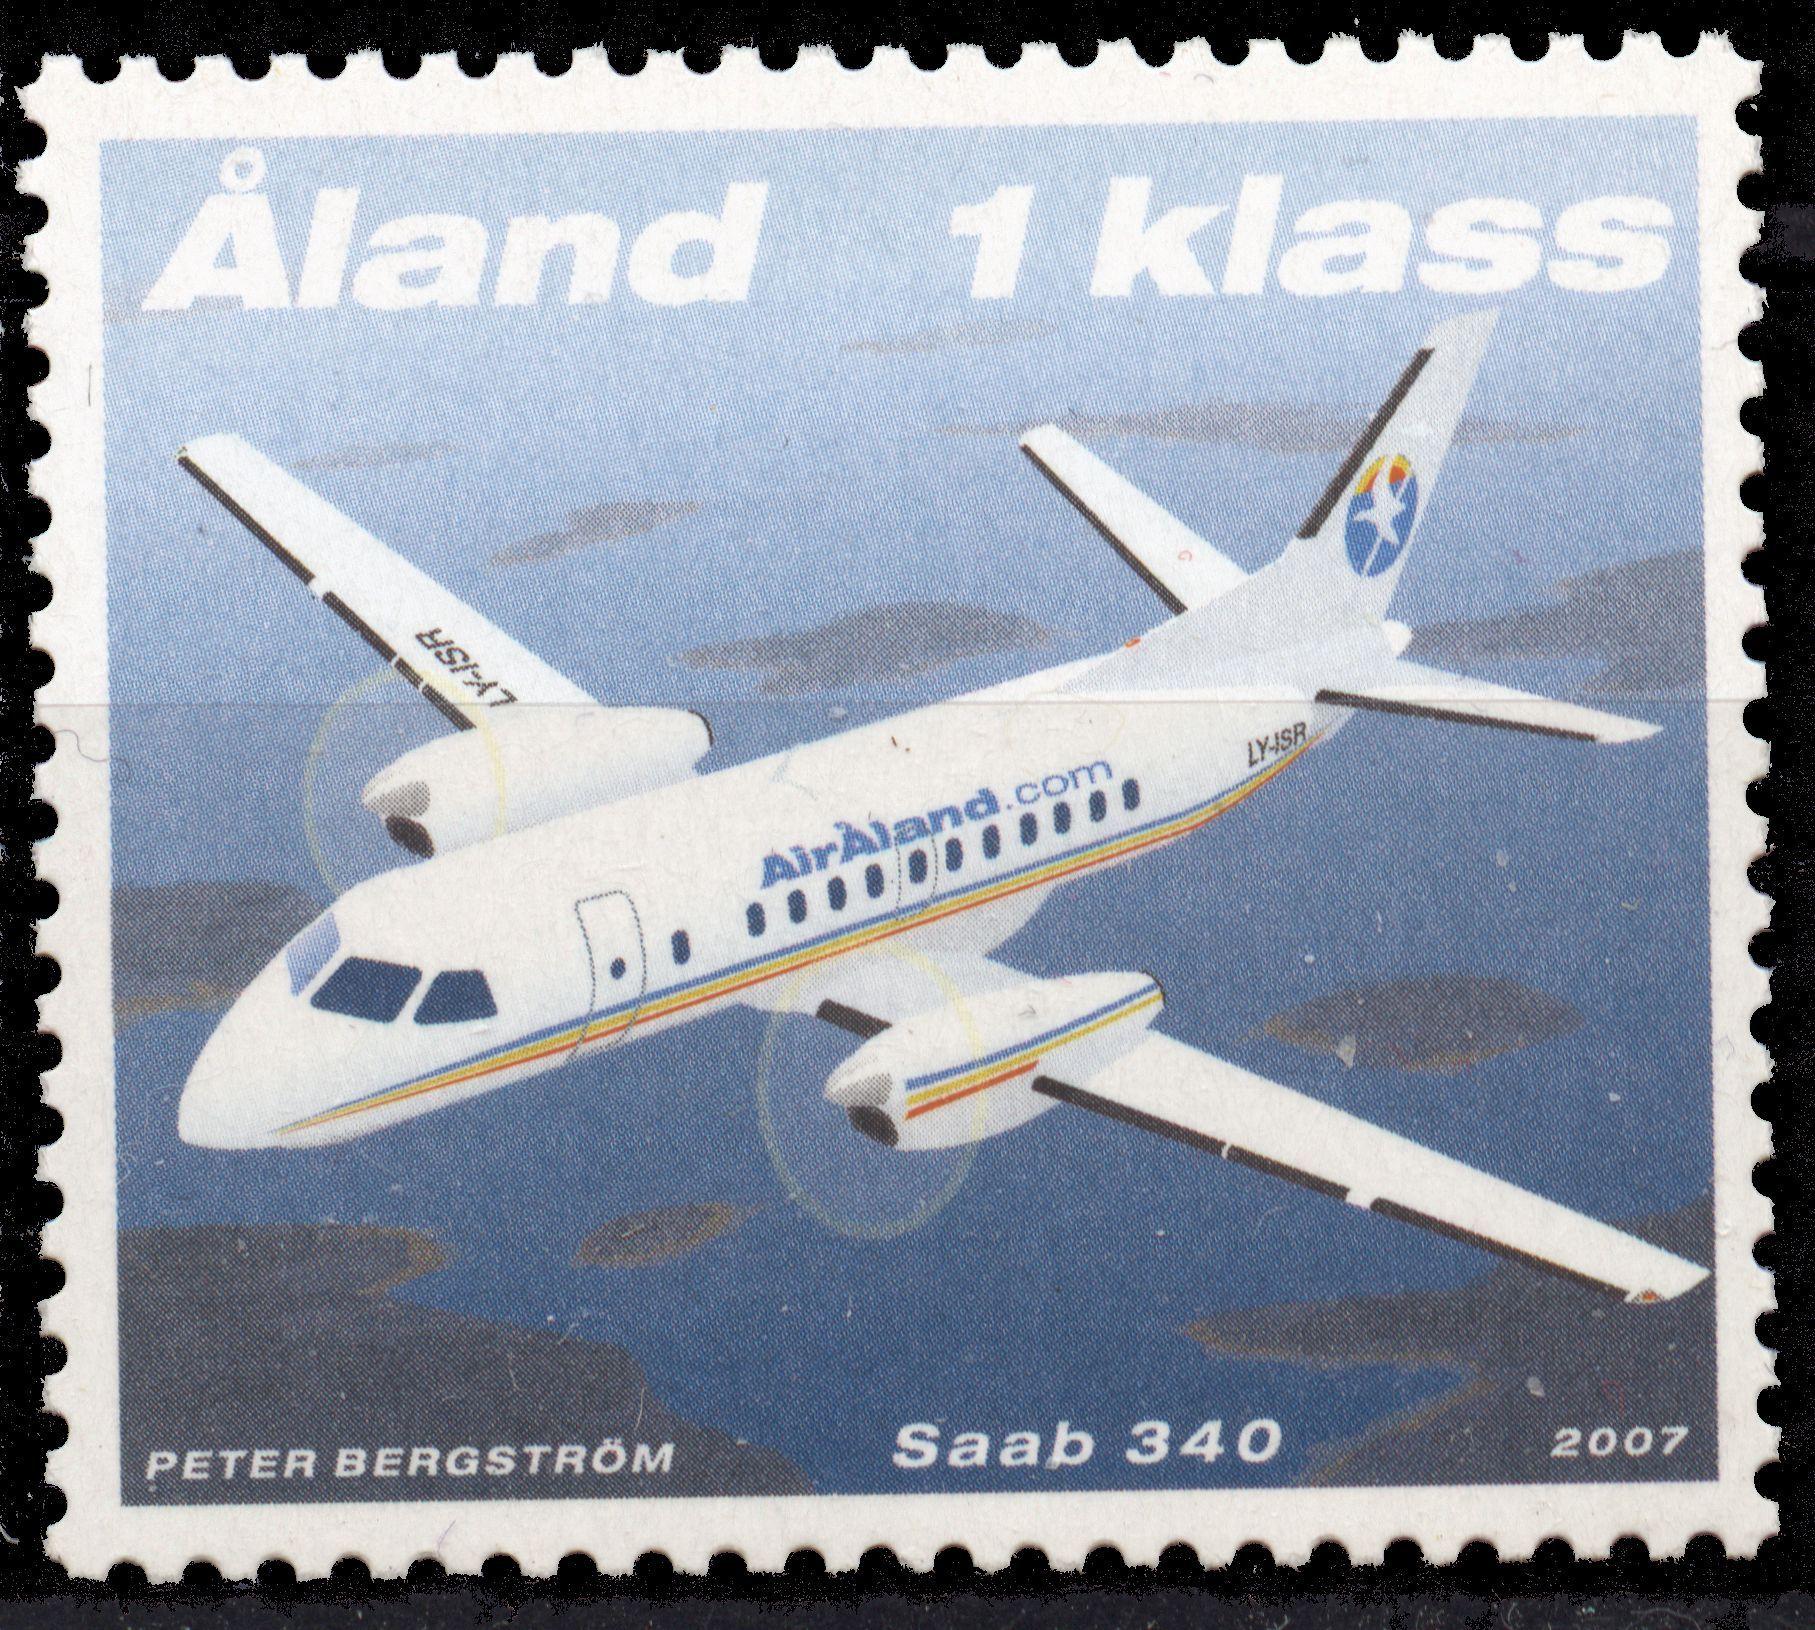 "Åland 1kl. ""SAAB 340"" 2007 [Facit: 278, Mi: 278, Y&T: 278, Sc: 259]"